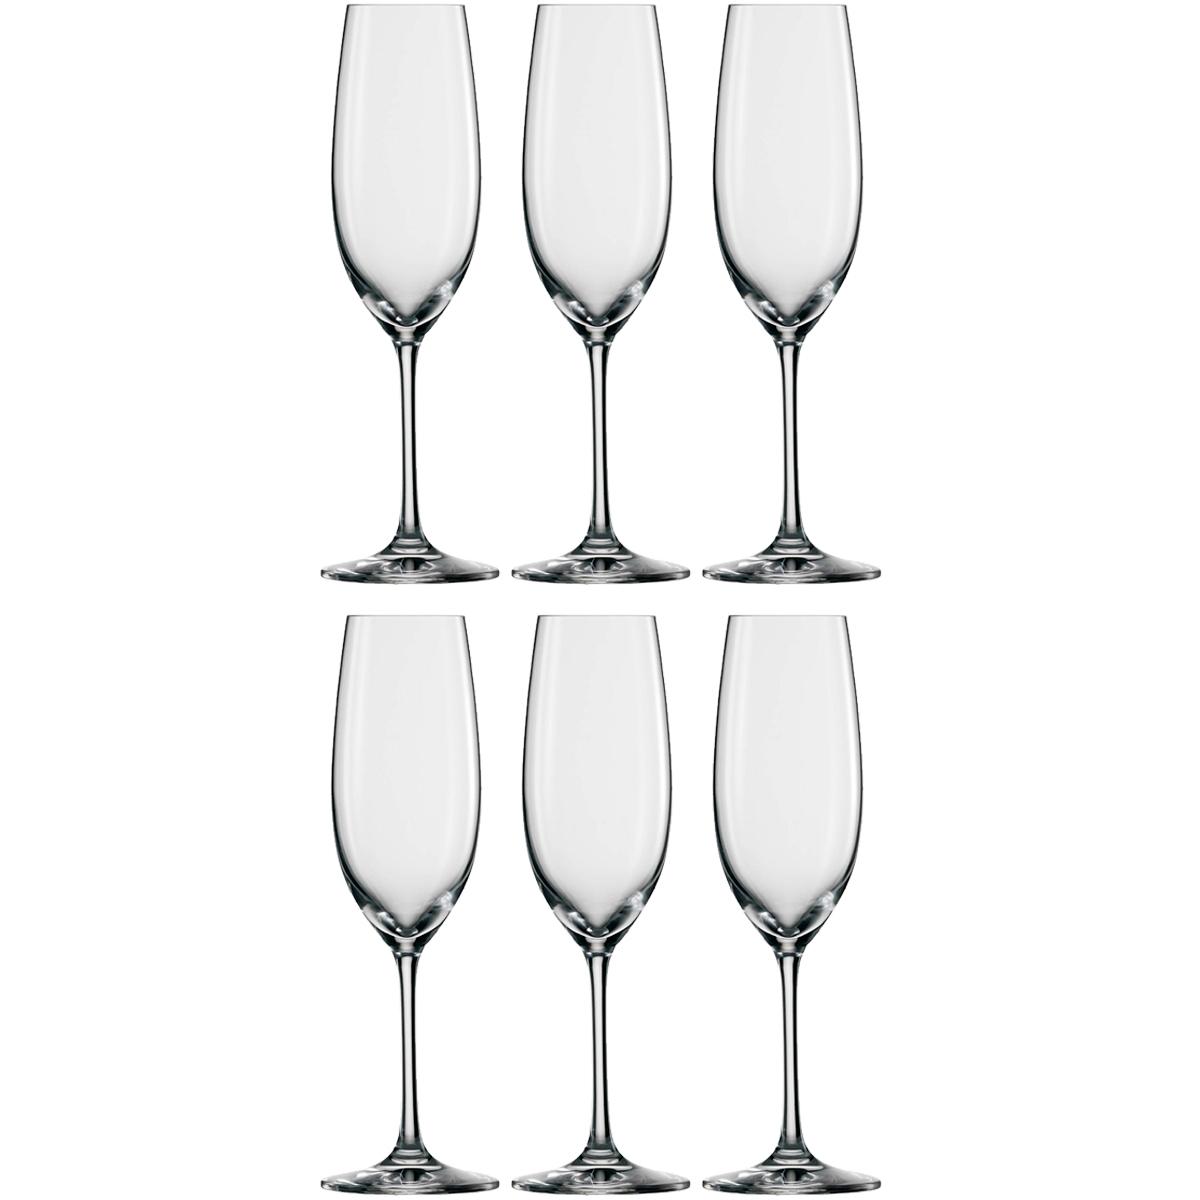 Copa cava ivento x6 gadgets cuina for Copas para champagne